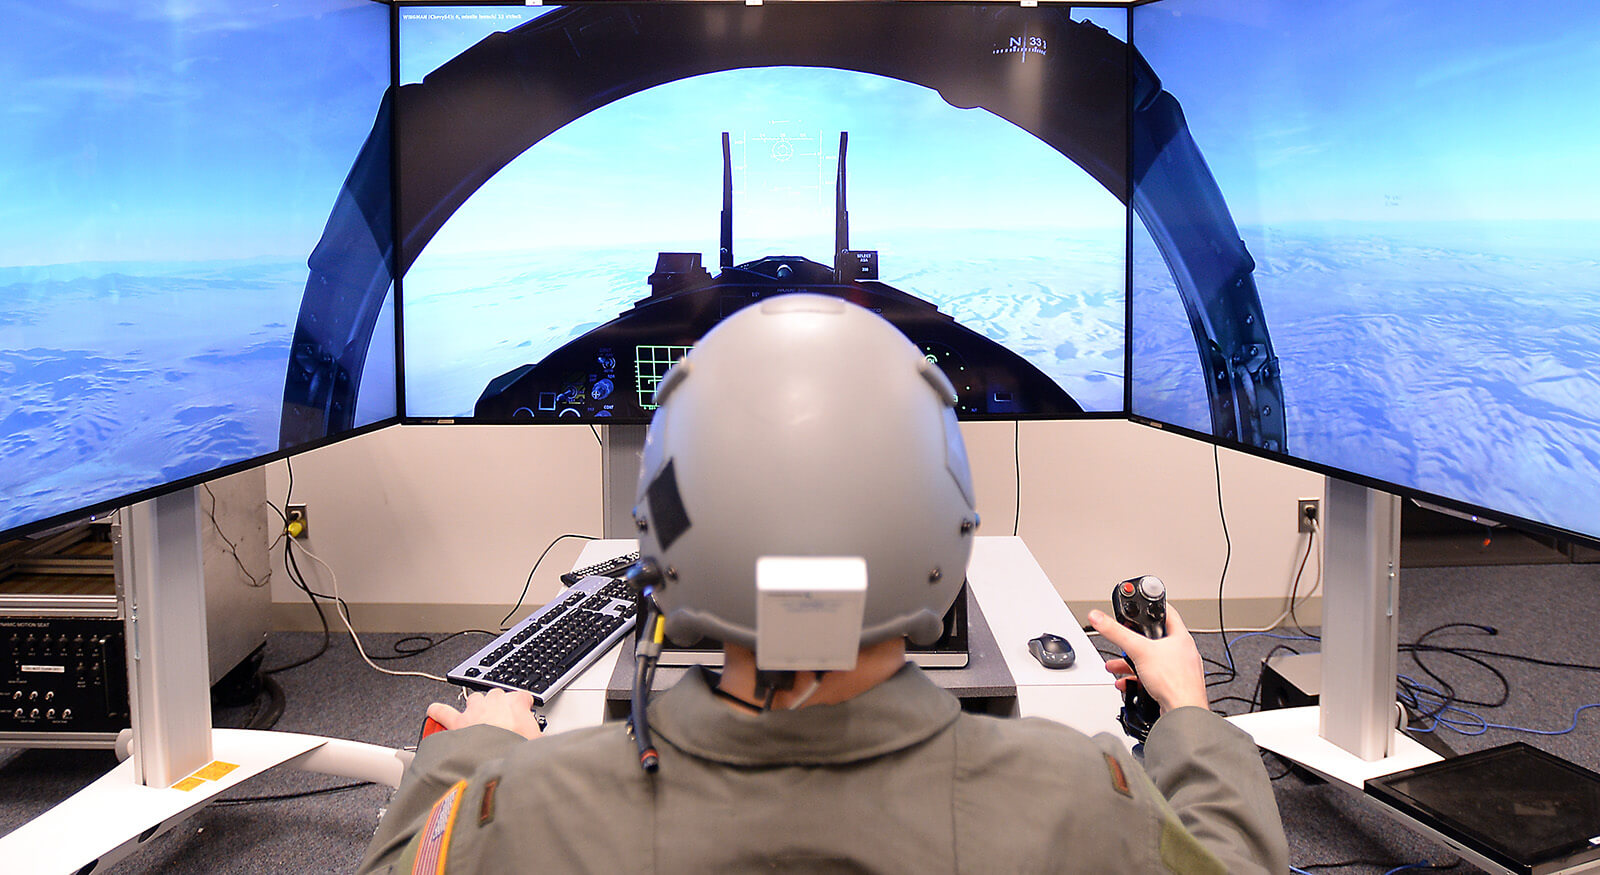 Warfighter Effectiveness Research Center